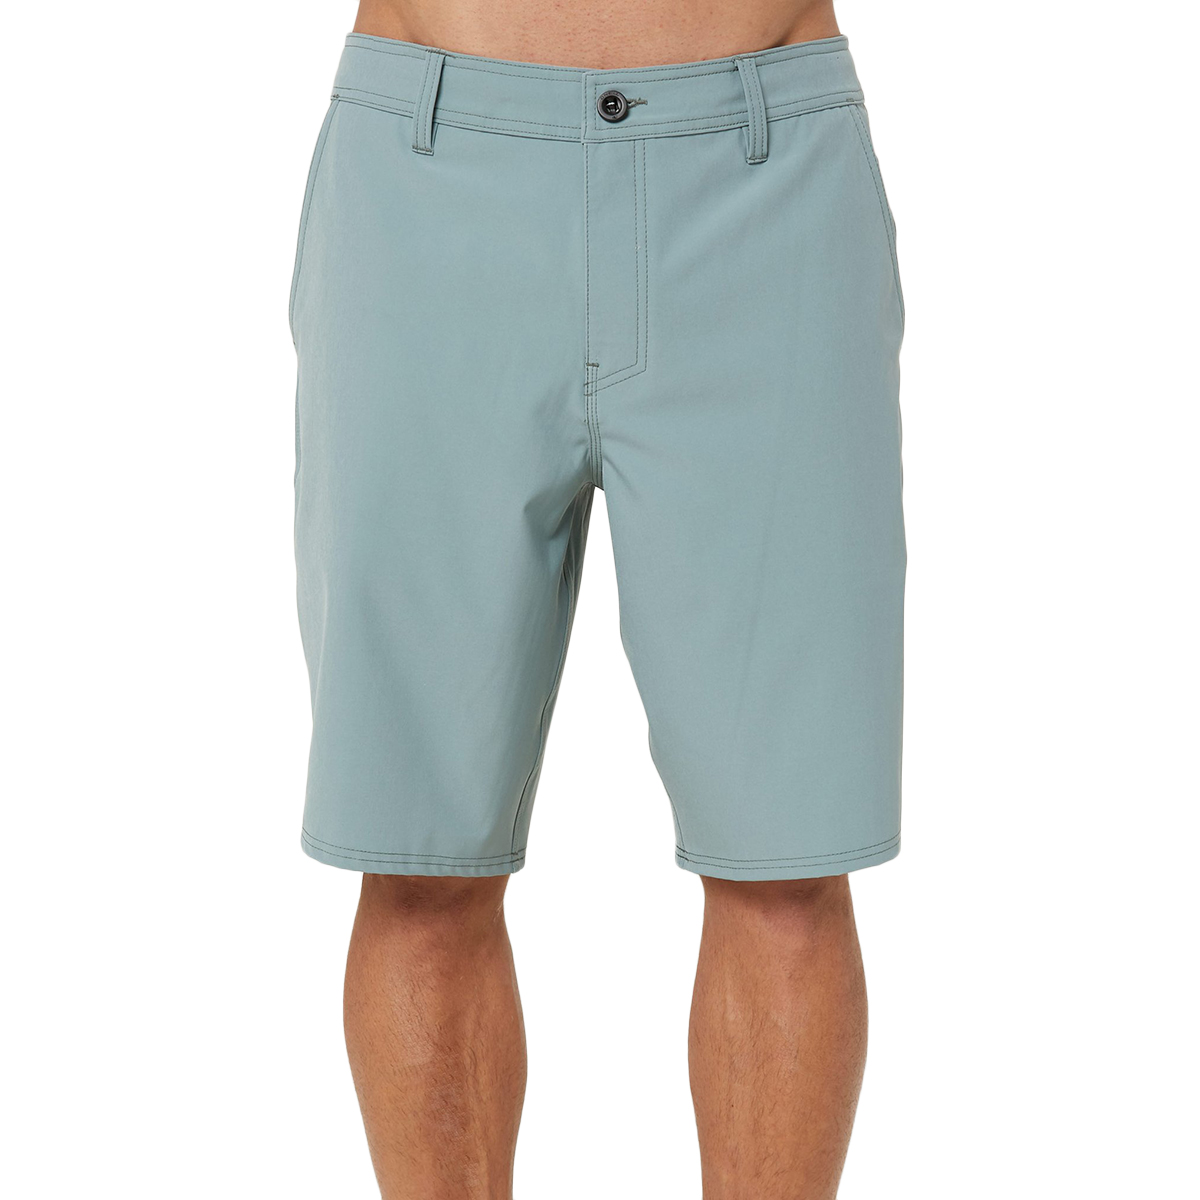 O'neill Men's Loaded Reserve Hybrid Shorts - Blue, 34